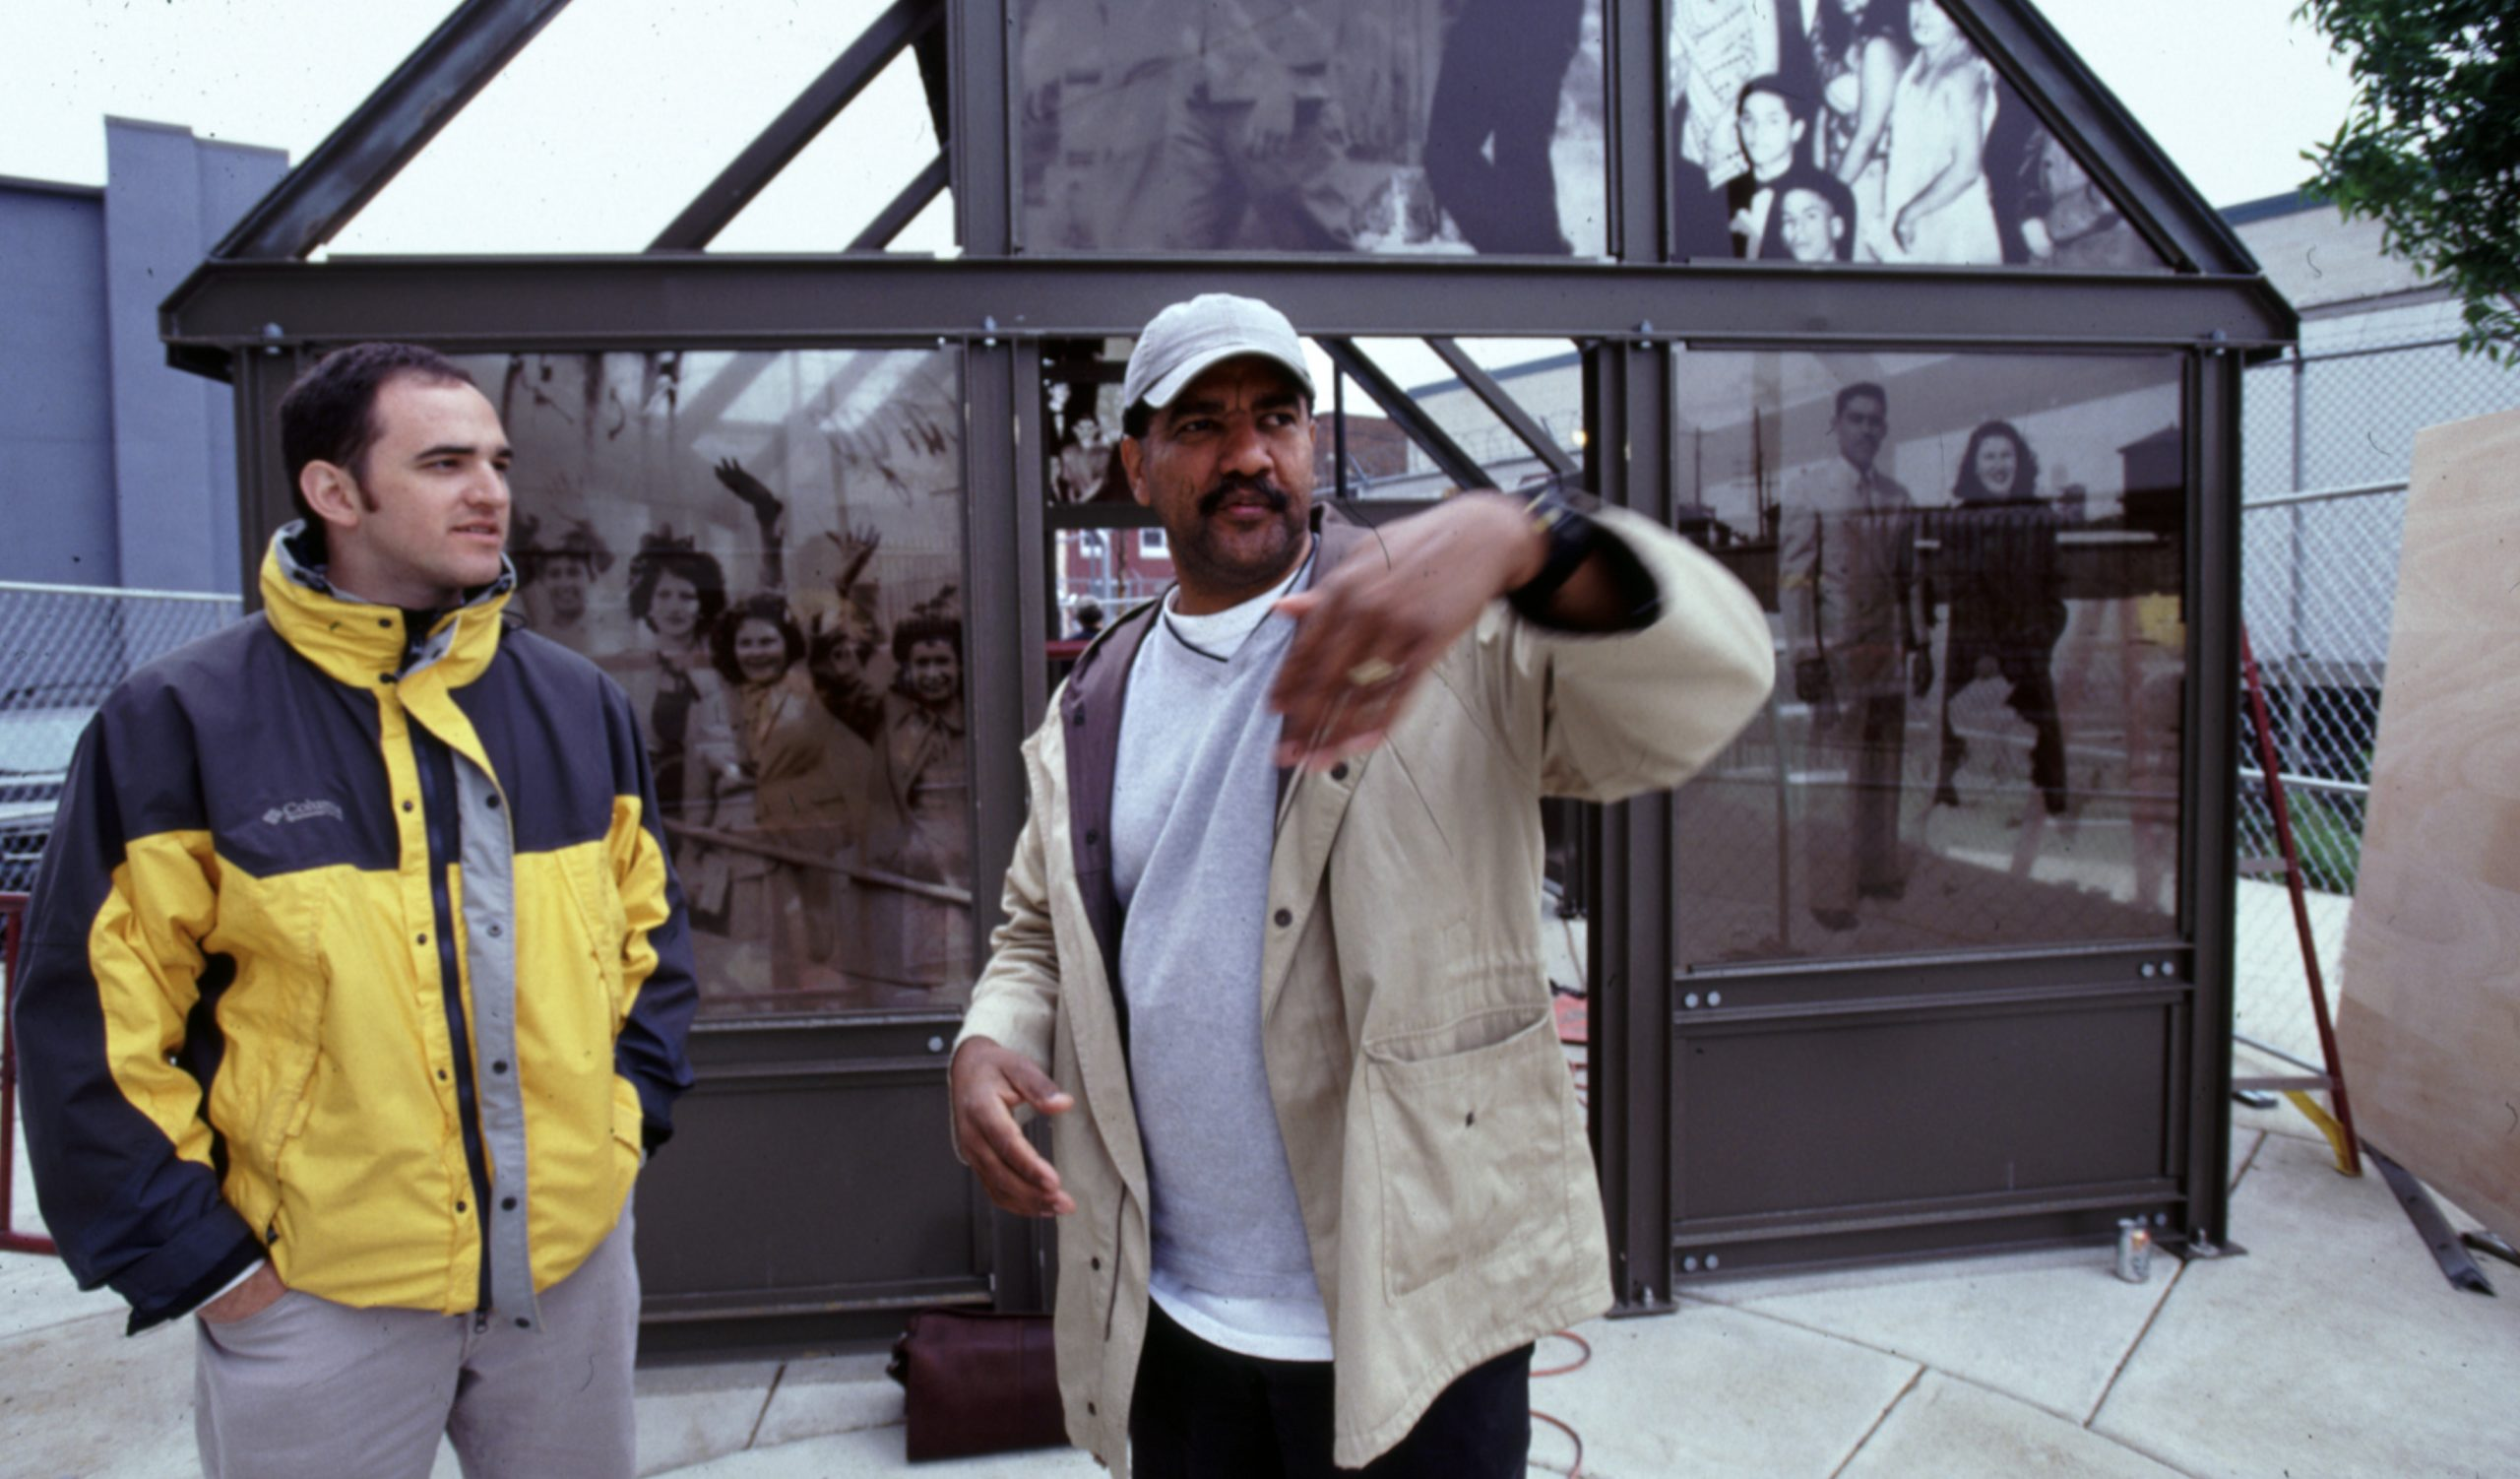 Artist Pepón Osorio in front of his public art installation in North Philadelphia in 2003